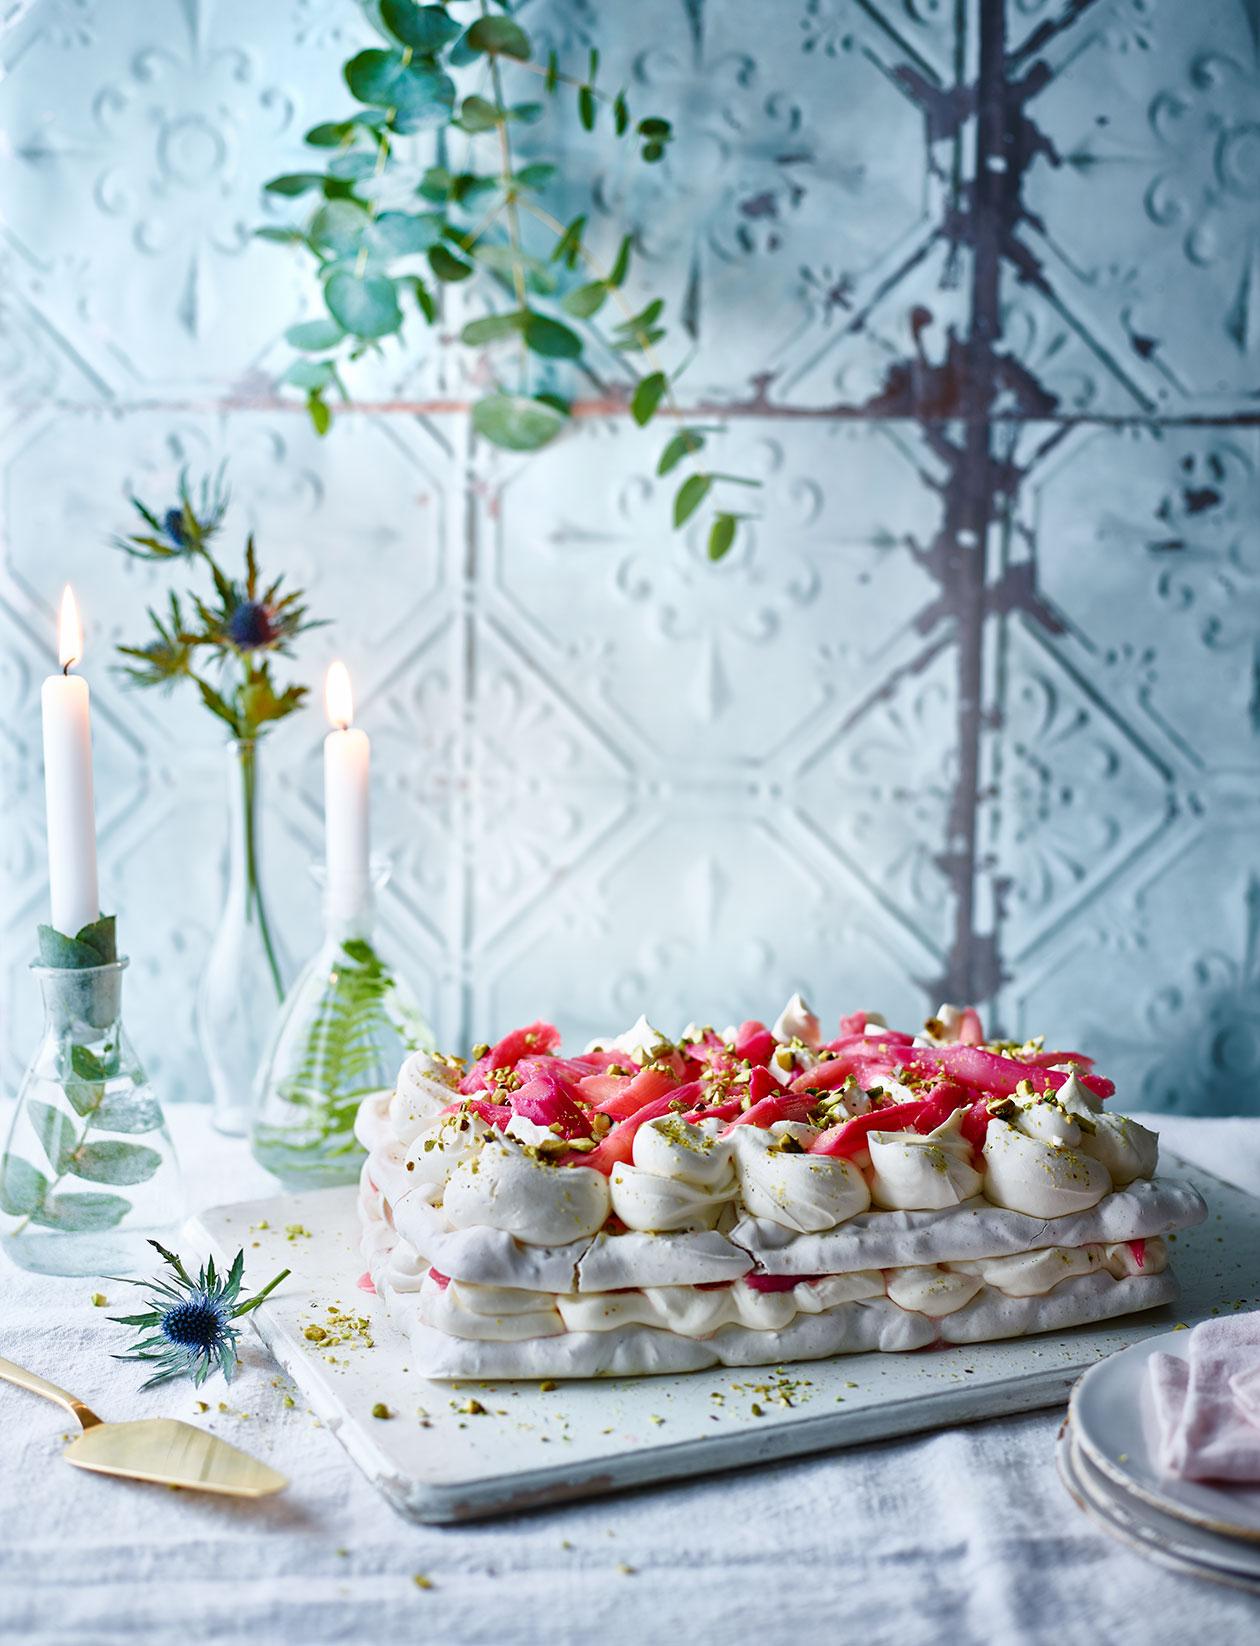 Pistachio and rhubarb meringue cake recipe Sainsburys Magazine